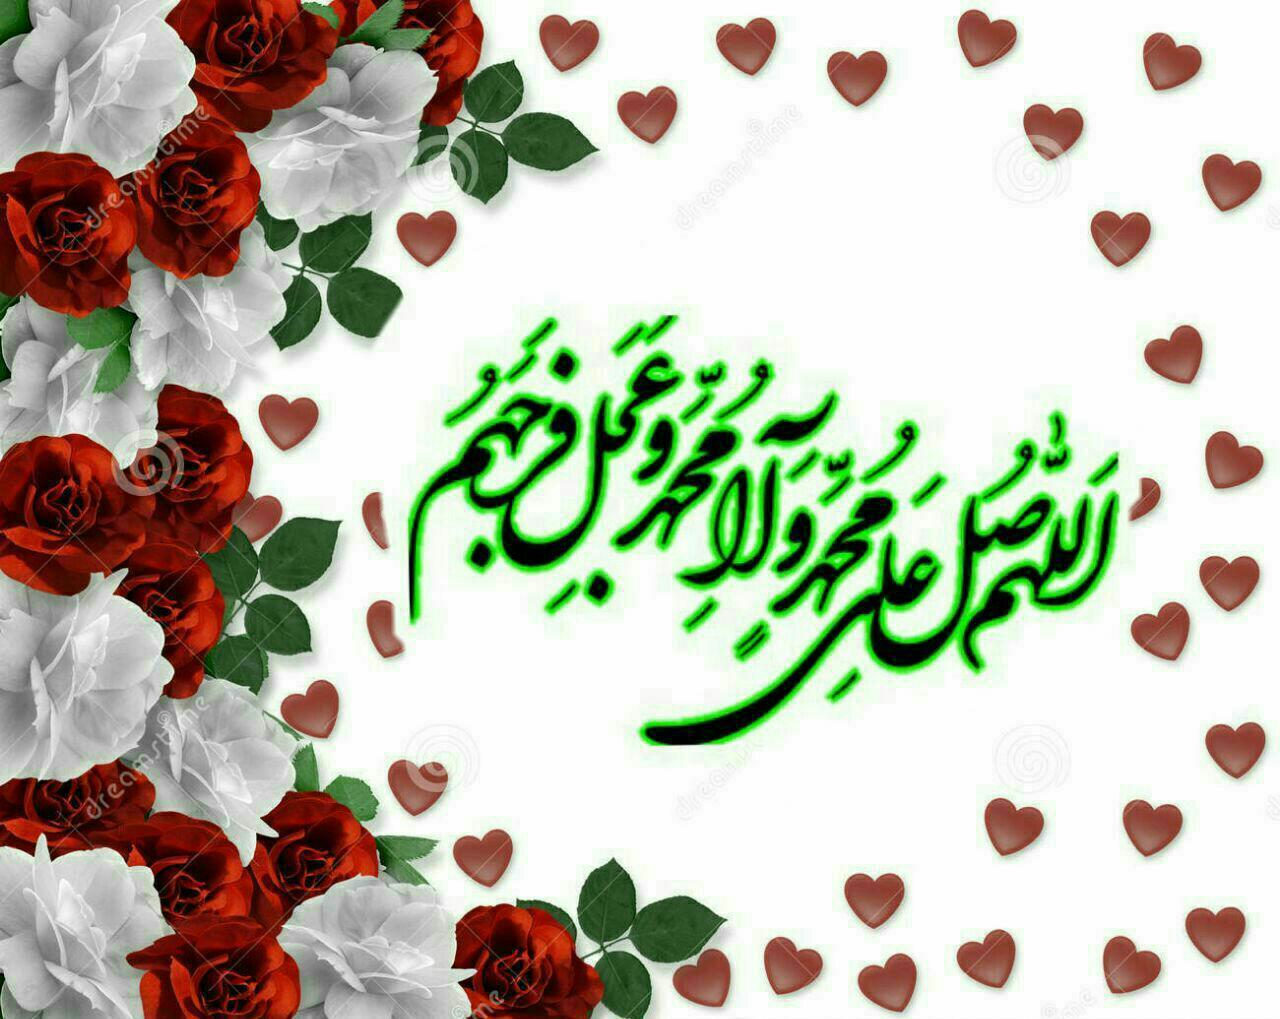 photo 2018 05 25 13 22 01 - شنبه روز ظهور امام زمان(عج)